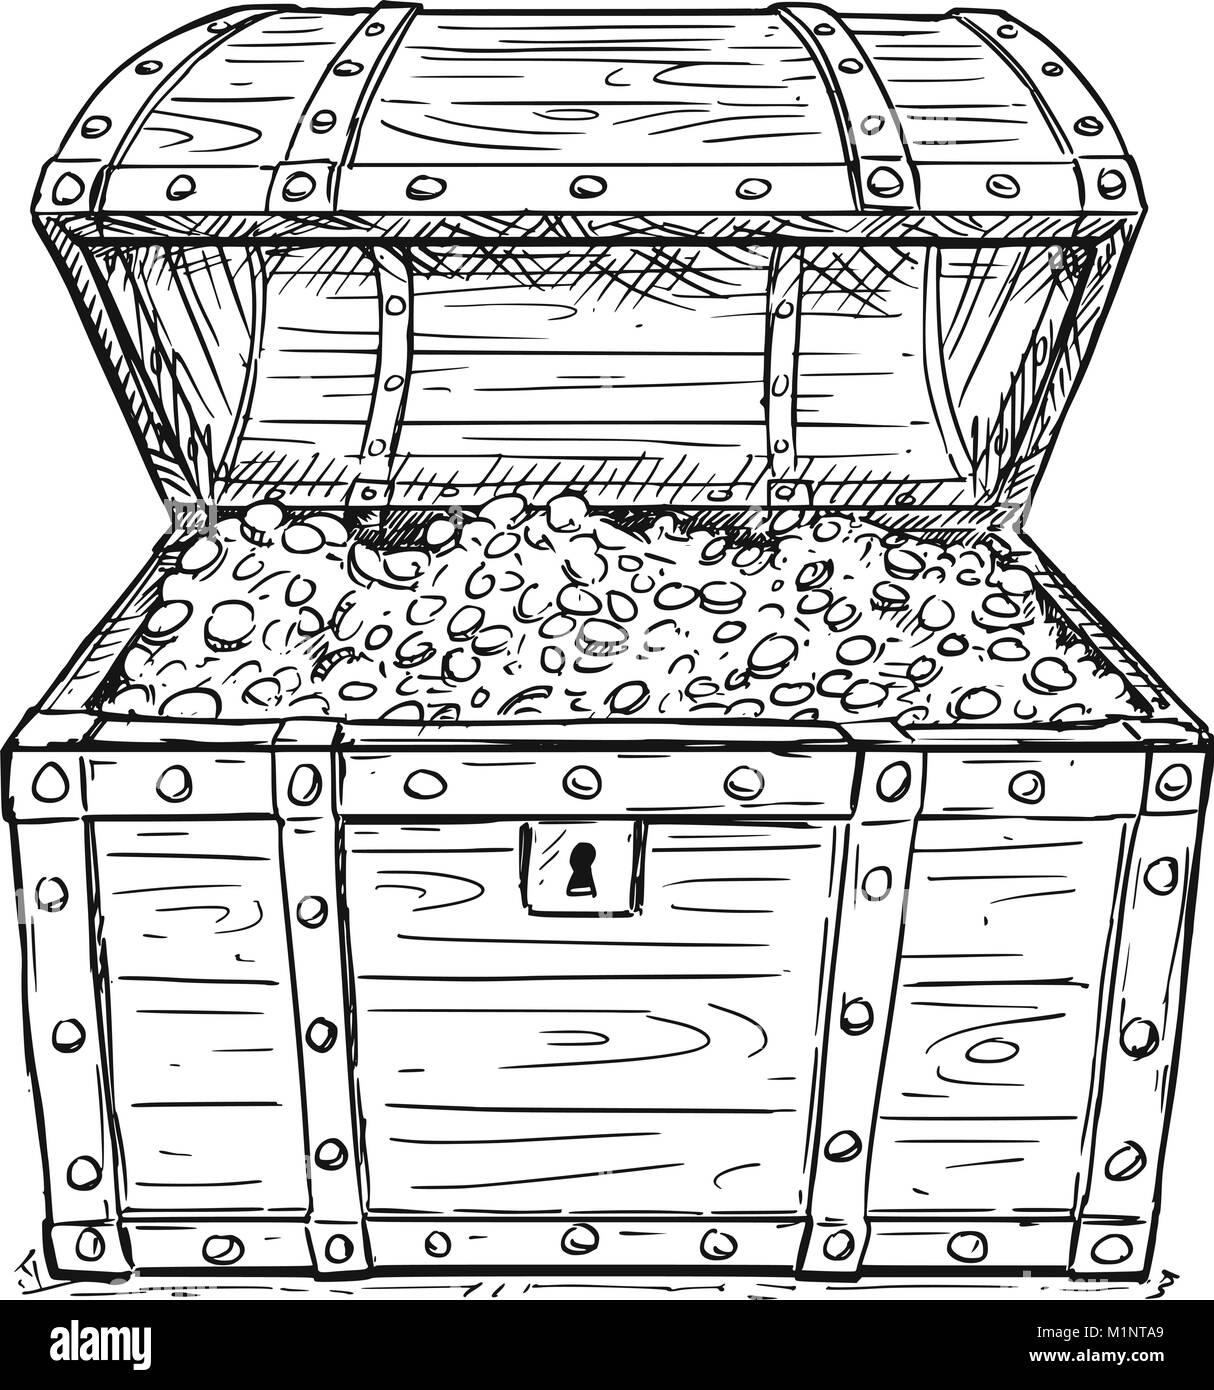 Pirate Treasure Chest Stock Photos & Pirate Treasure Chest ...